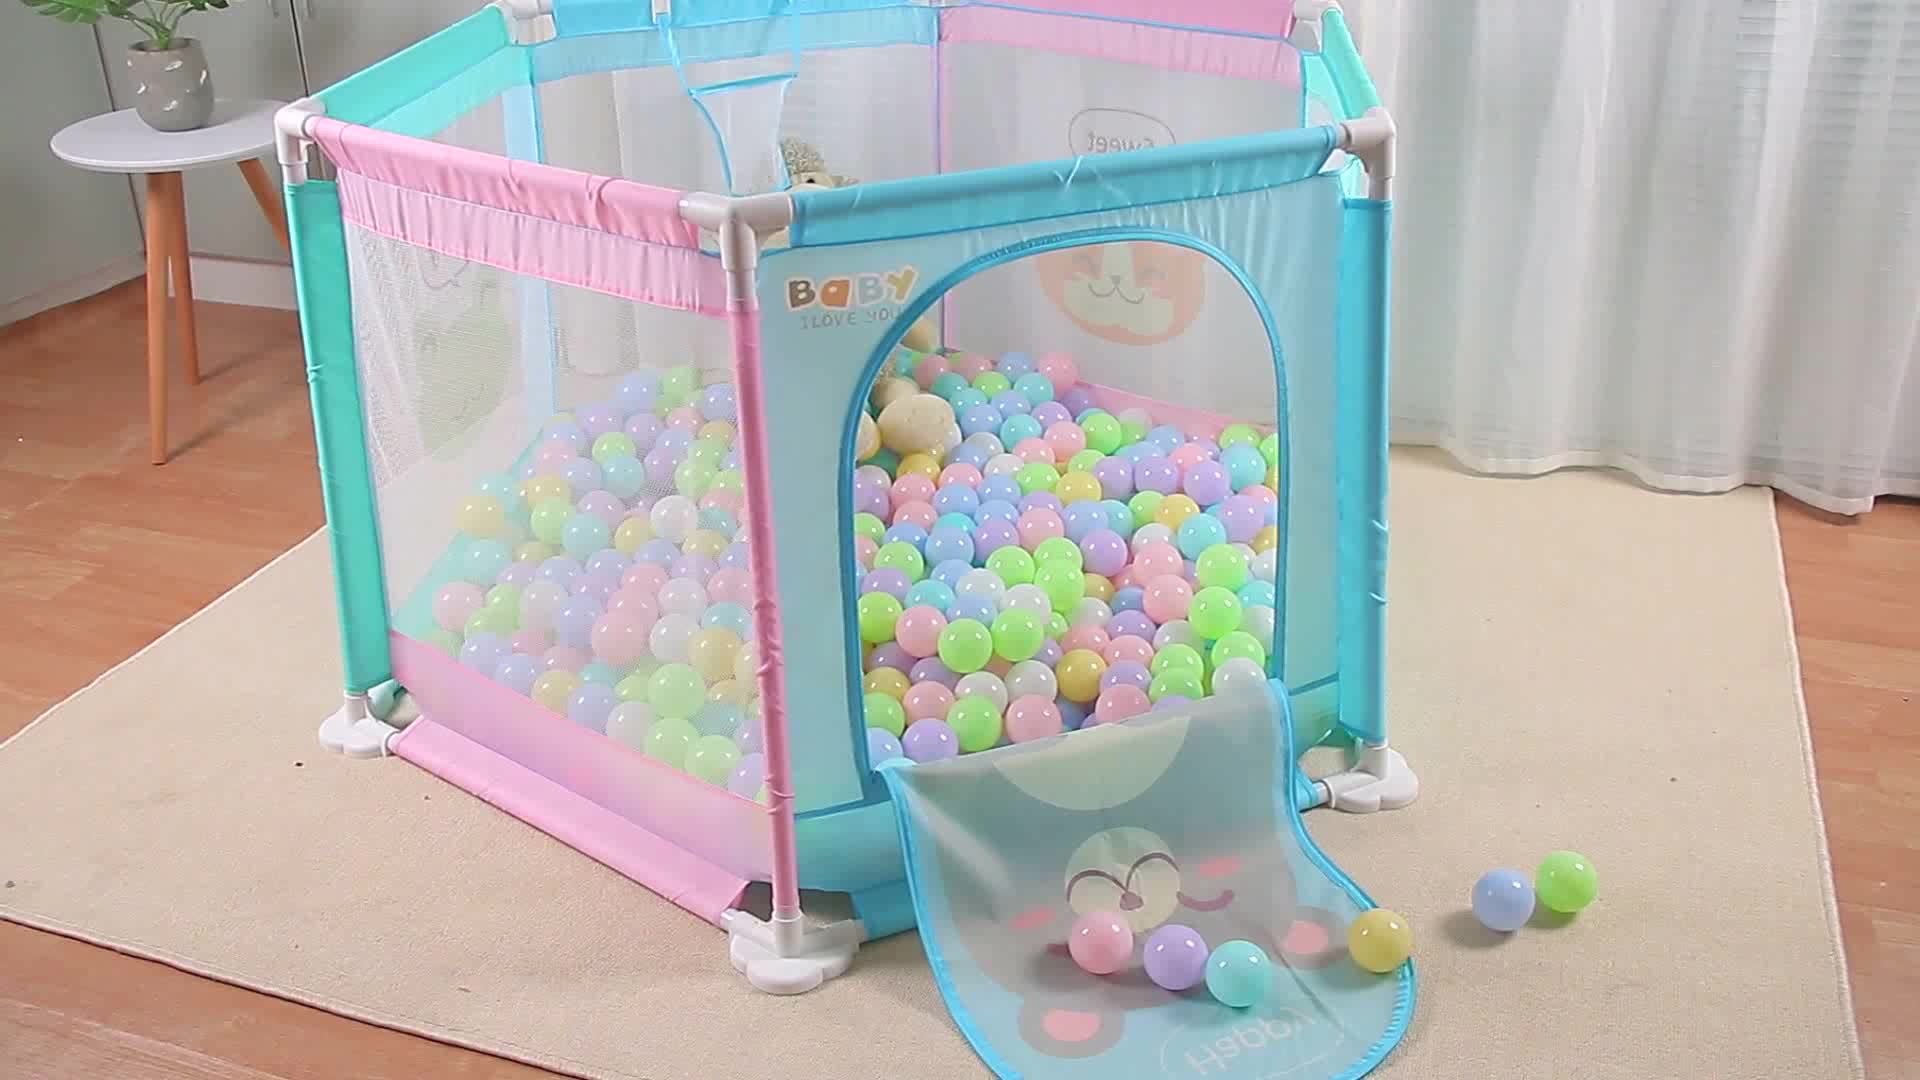 European Standard Baby Outdoor Portable Baby Play Yard / Baby Playpen / Baby Playard